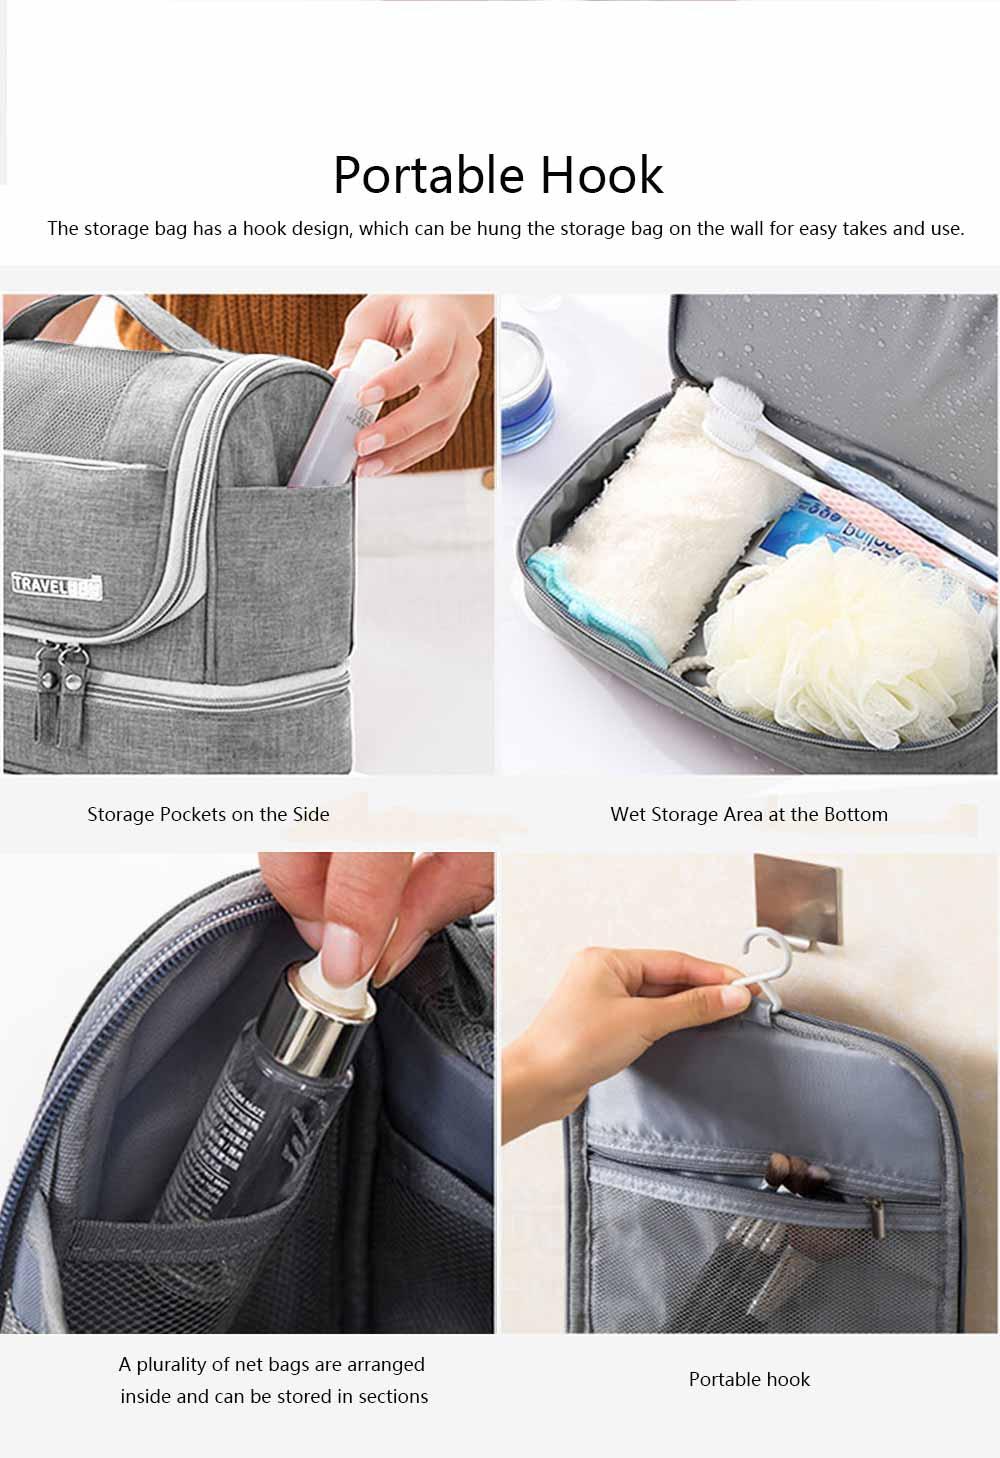 Storage Bag Dry Wet Depart Wash Bag Large Capacity Portable Waterproof Cosmetic Bag for Travel Business Trip 3